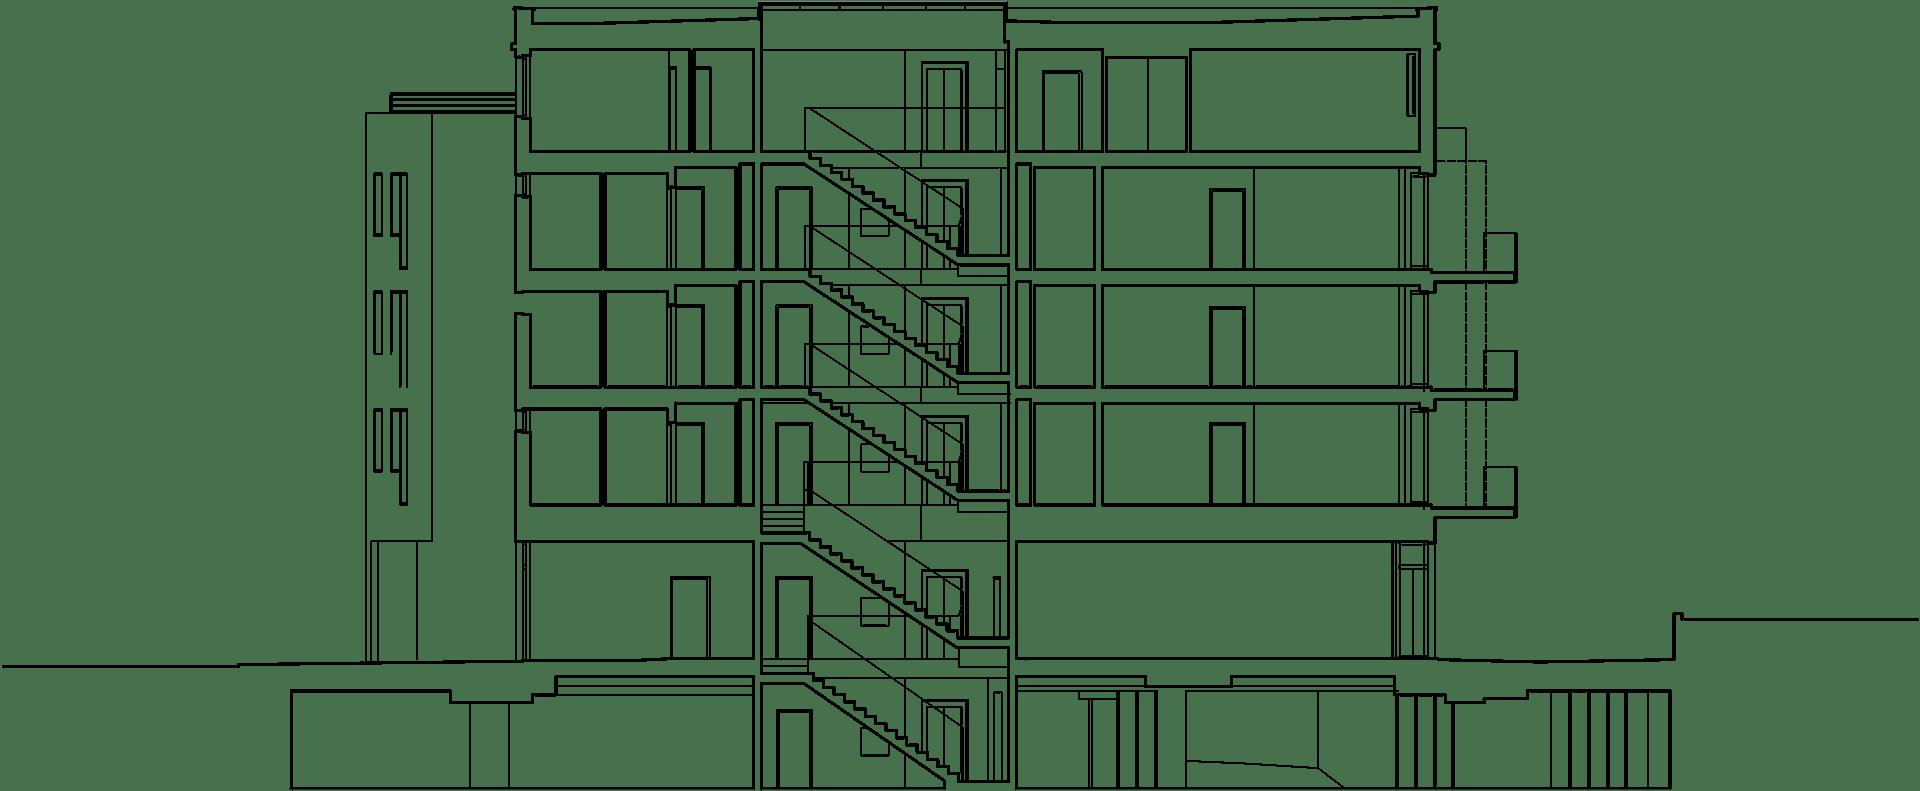 Hloubetin-drawing-4-1